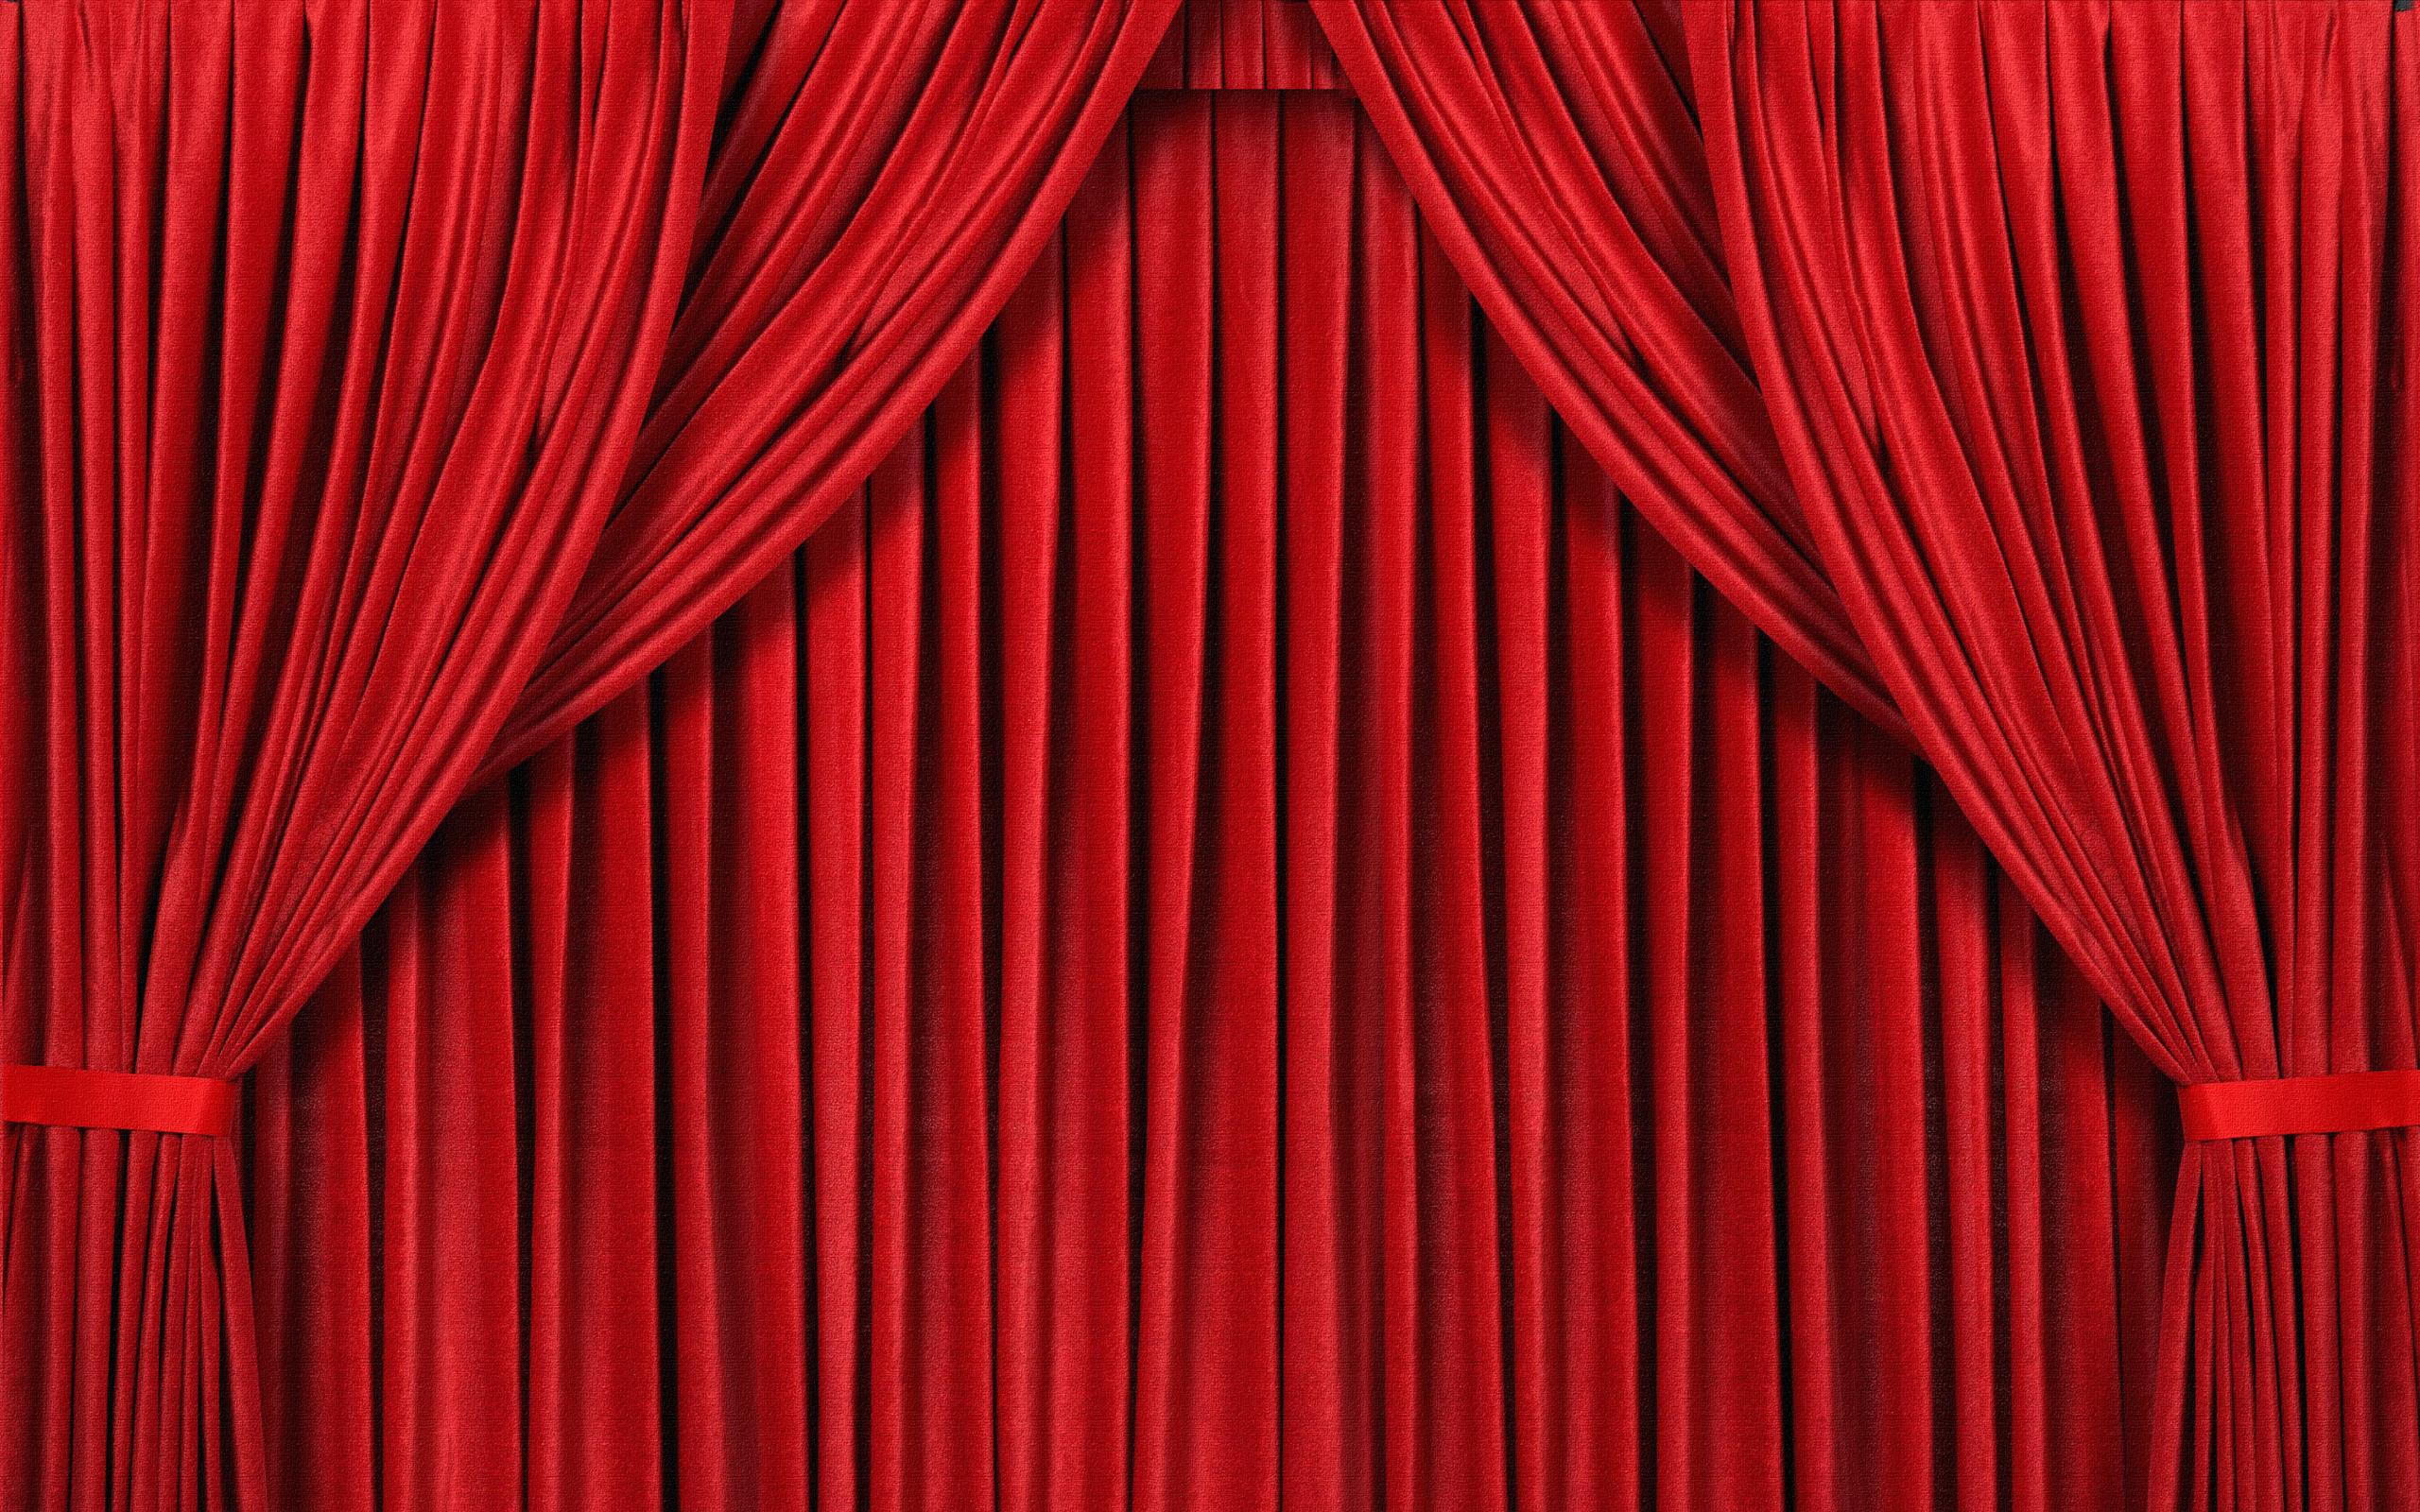 Red Wallpaper wallpaper Red Wallpaper hd wallpaper background 2560x1600